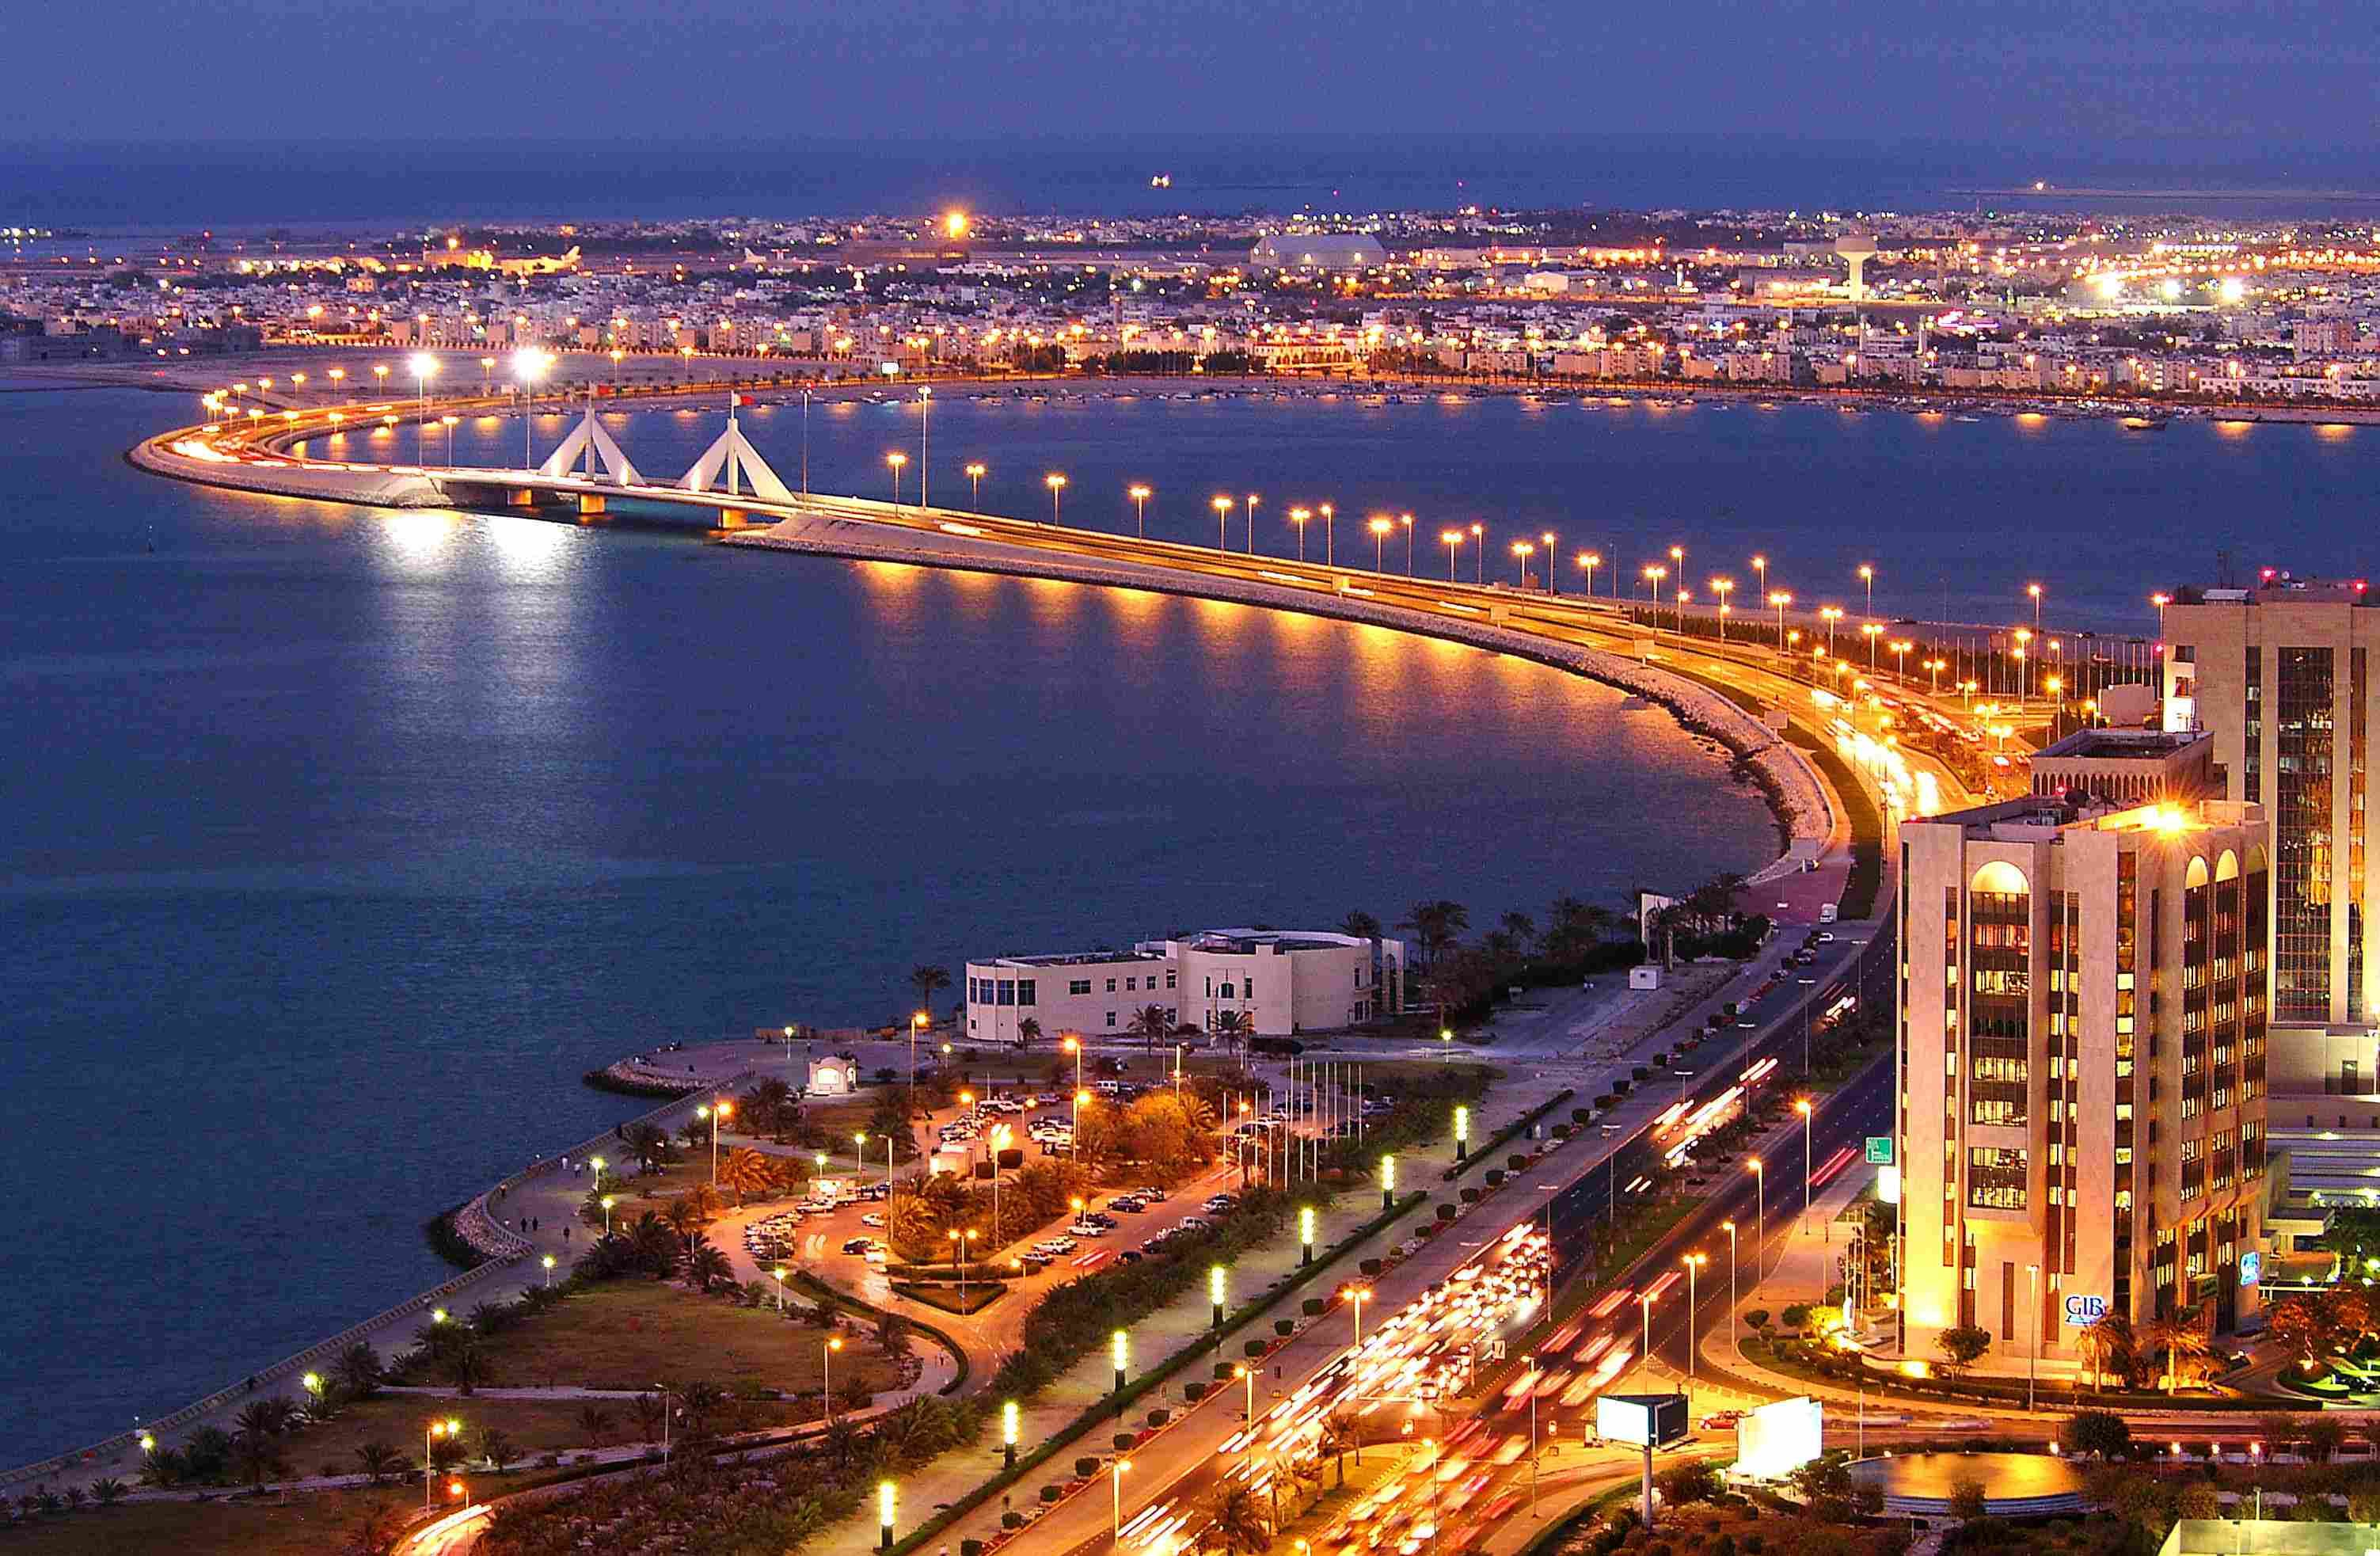 bahrain_night_city